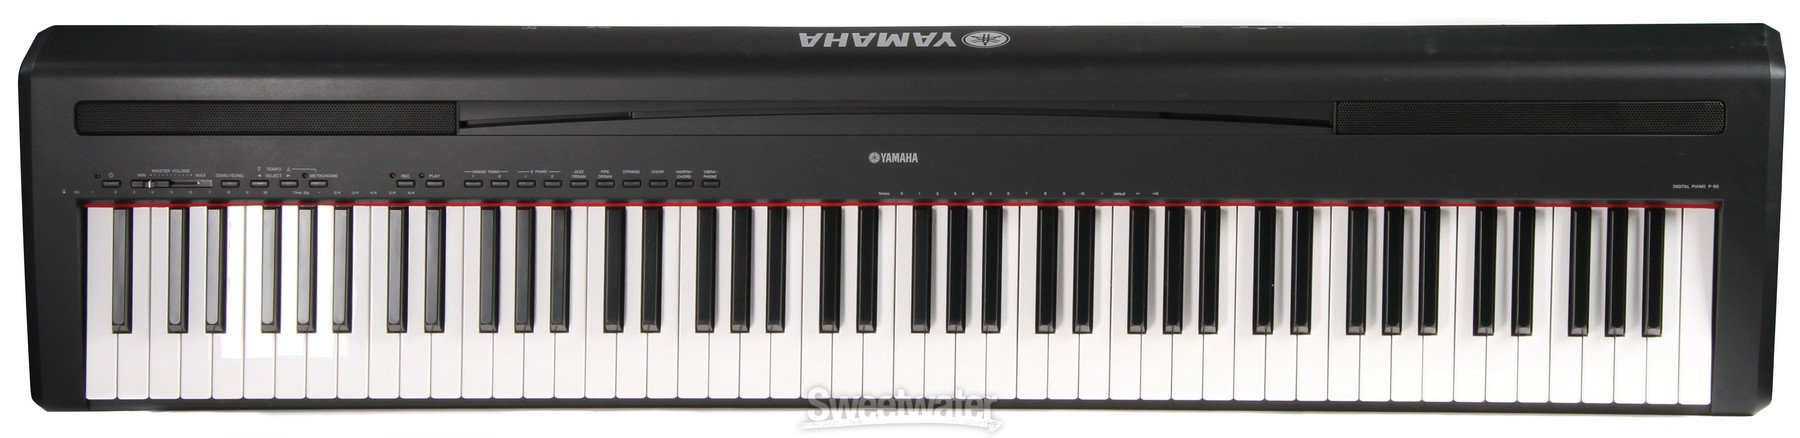 Yamaha P-95 | Sweetwater